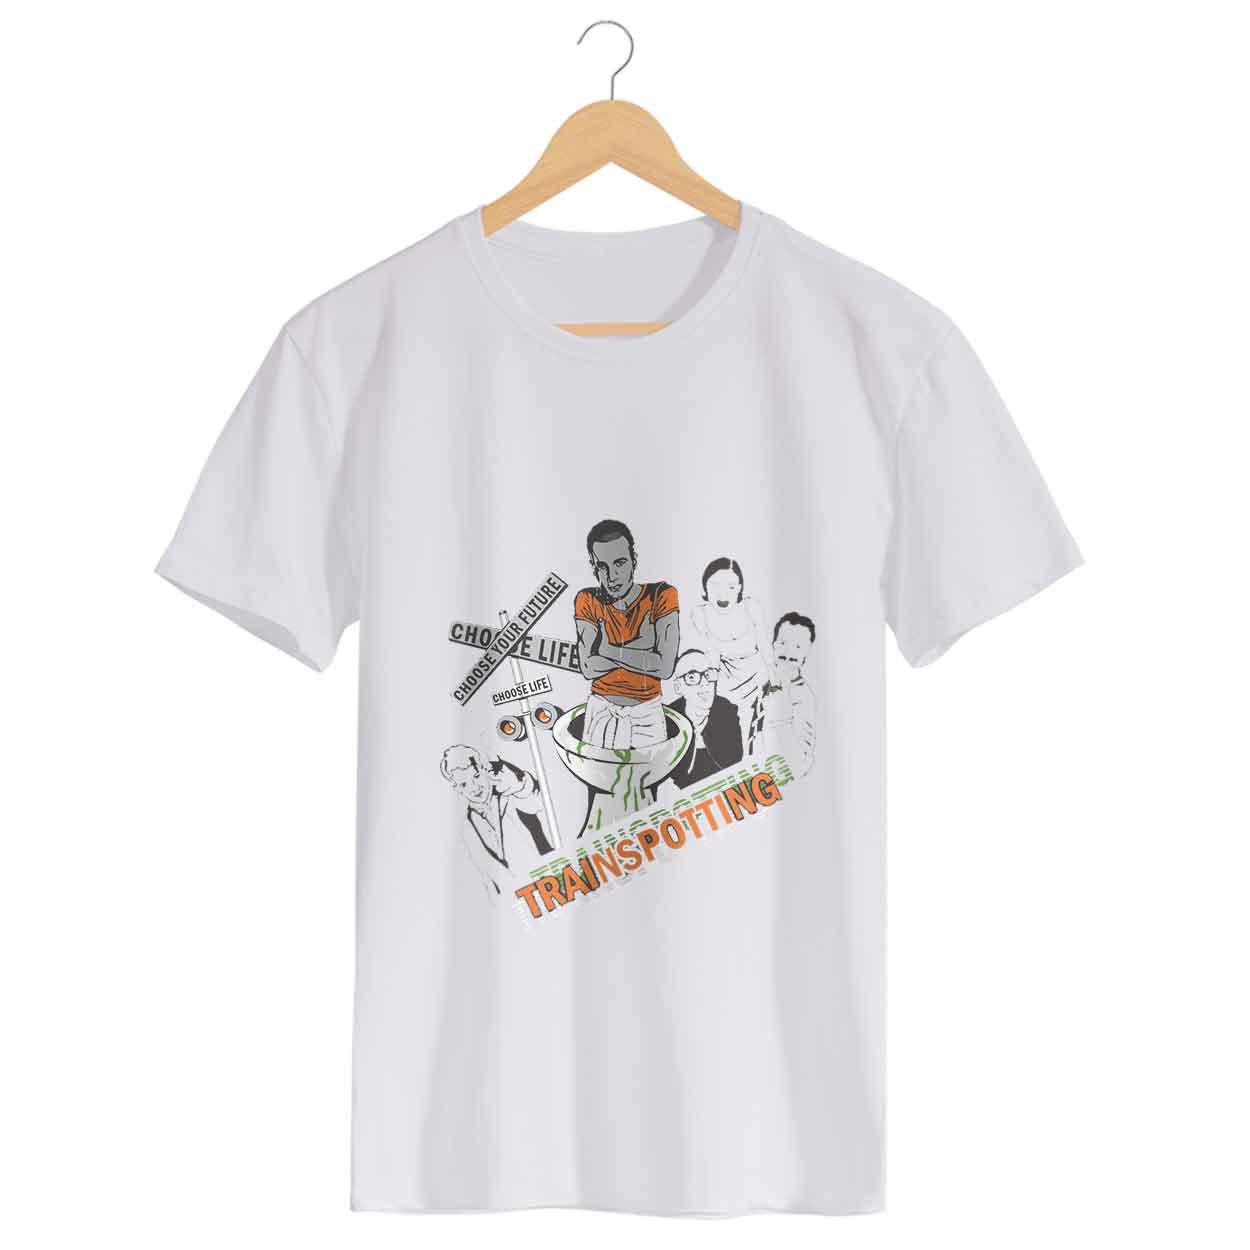 Camiseta - Choose Life - Trainspotting  - Massculino